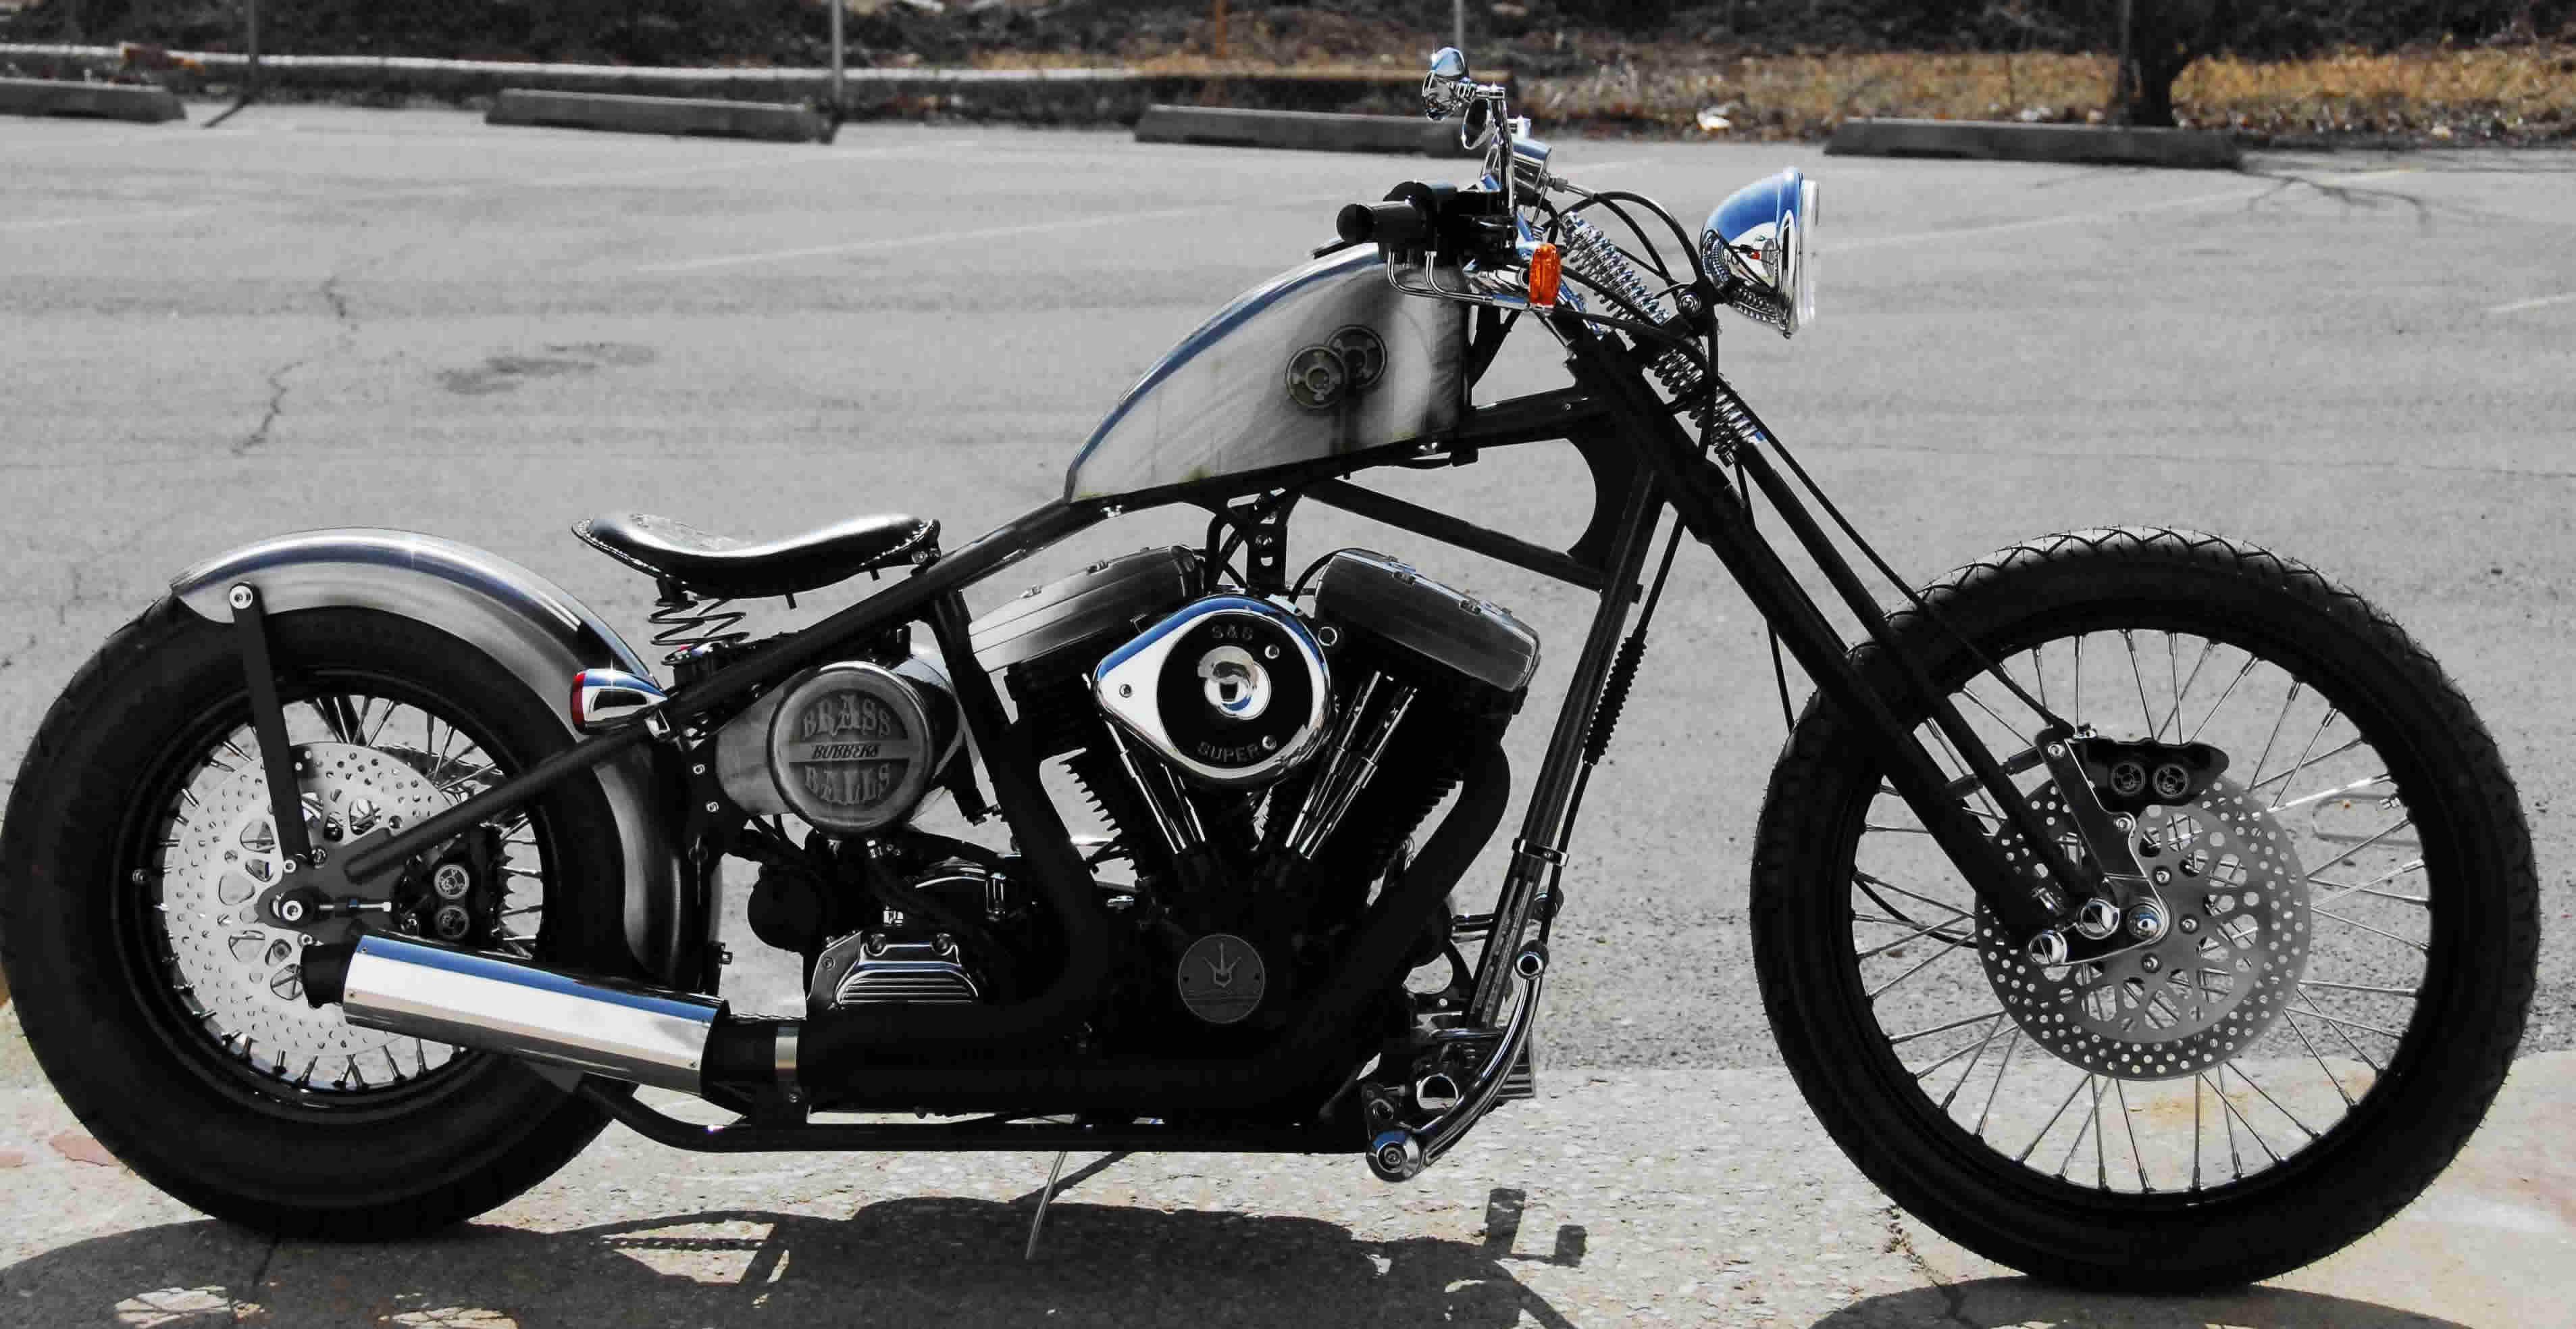 Motorcycle Custom: [42+] Old School Chopper Wallpaper On WallpaperSafari